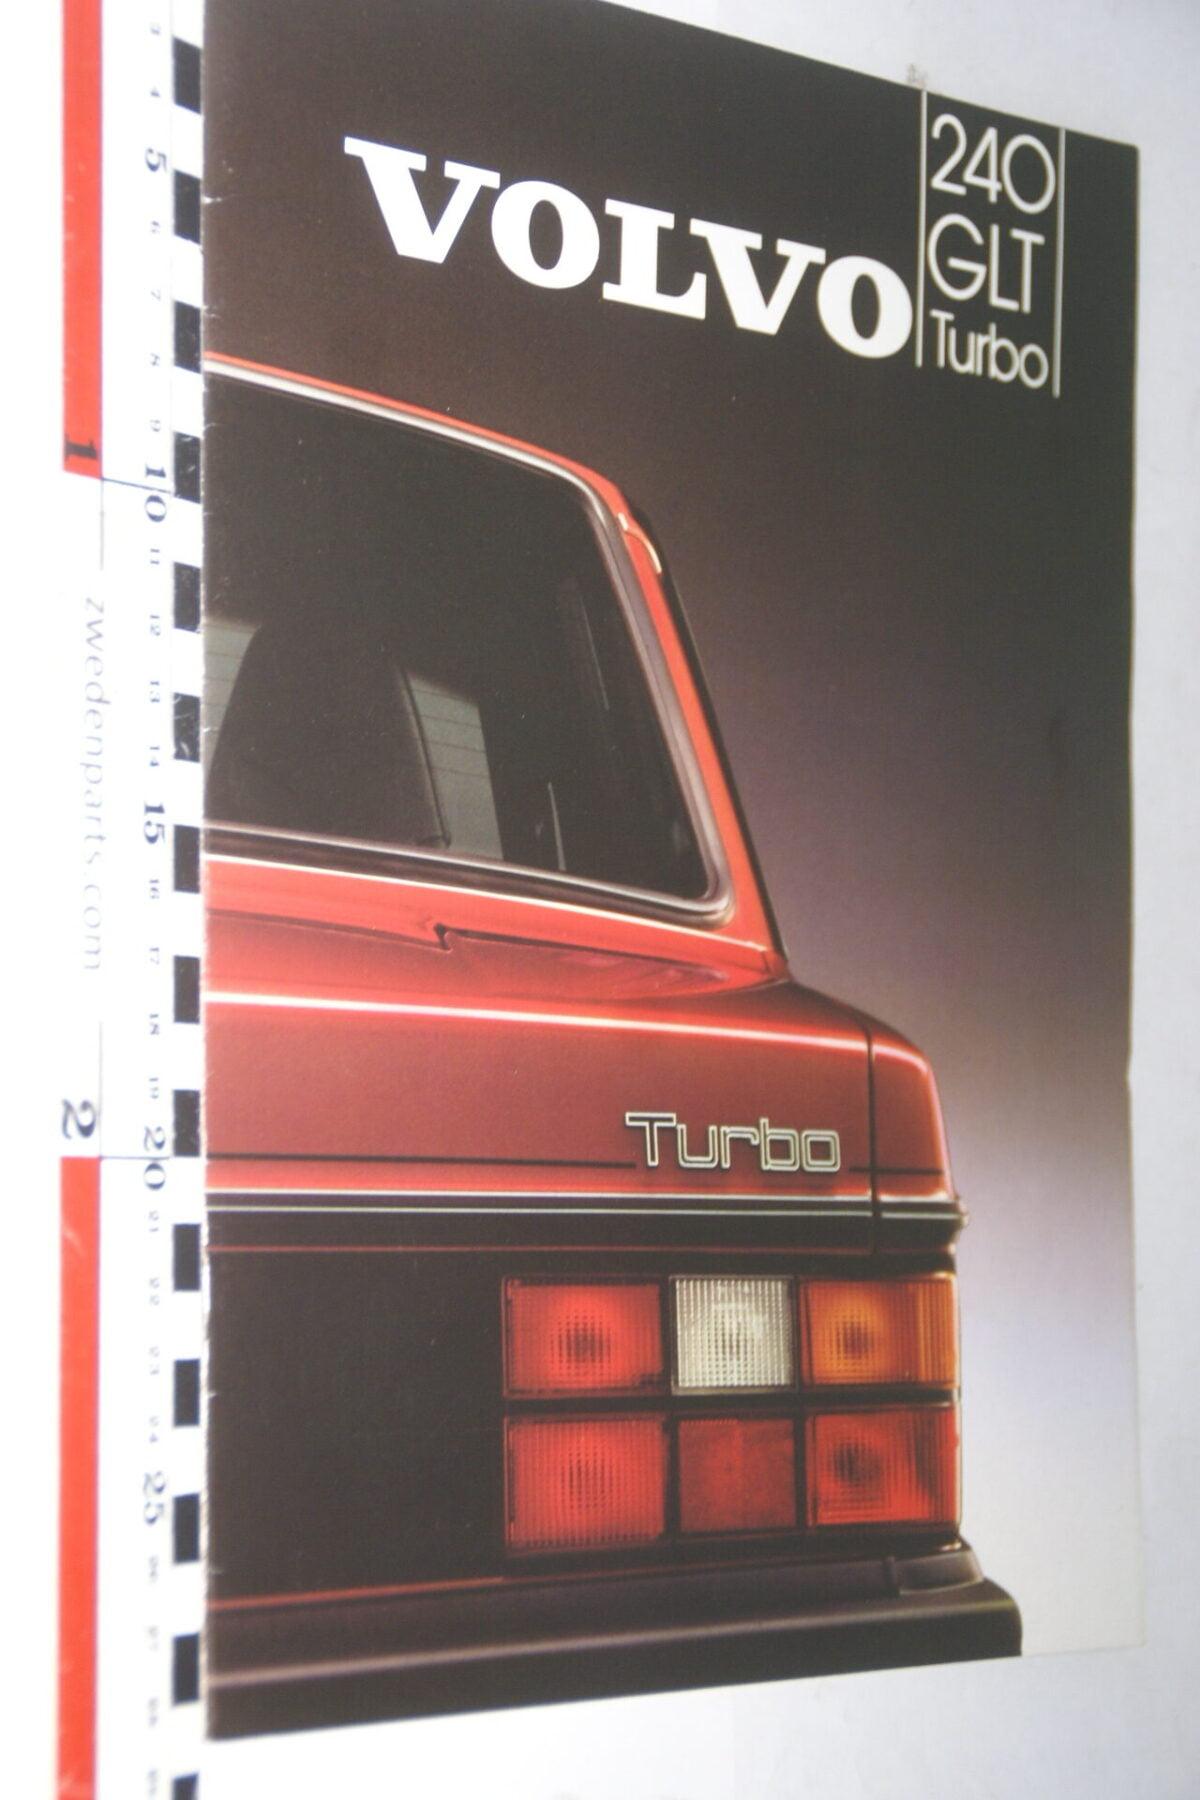 DSC07647 1983 originele brochure Volvo 244GLT Turbo nr MSPV 1215, Svenska-a8362d73